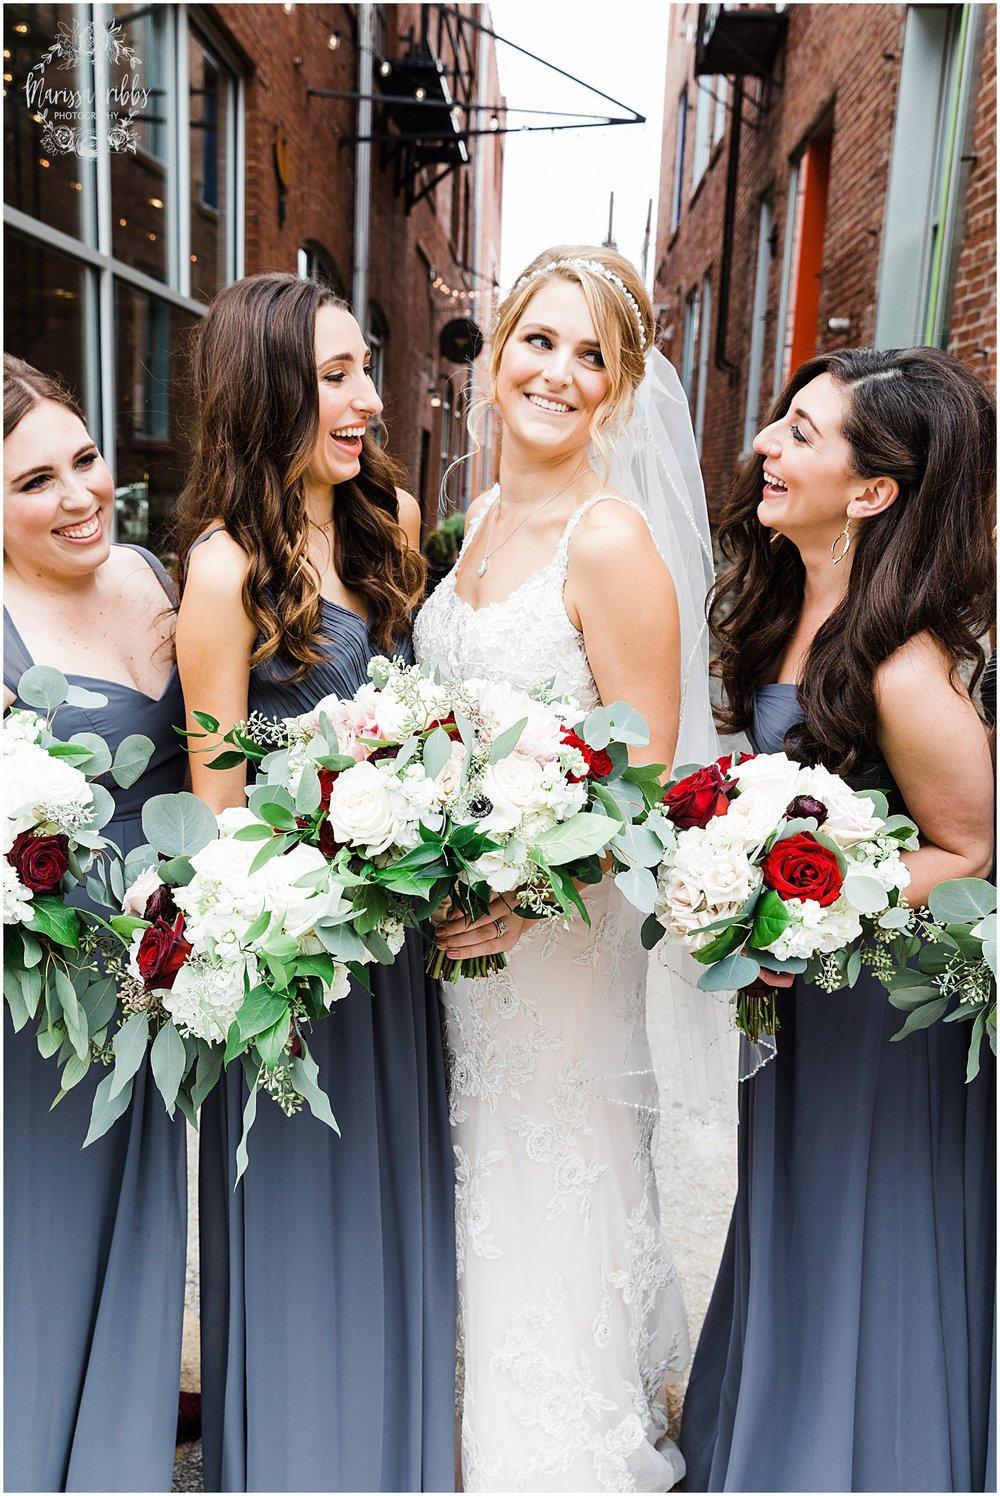 BAUER WEDDING | KELSEA & JUSTIN | MARISSA CRIBBS PHOTOGRAPHY_6519.jpg